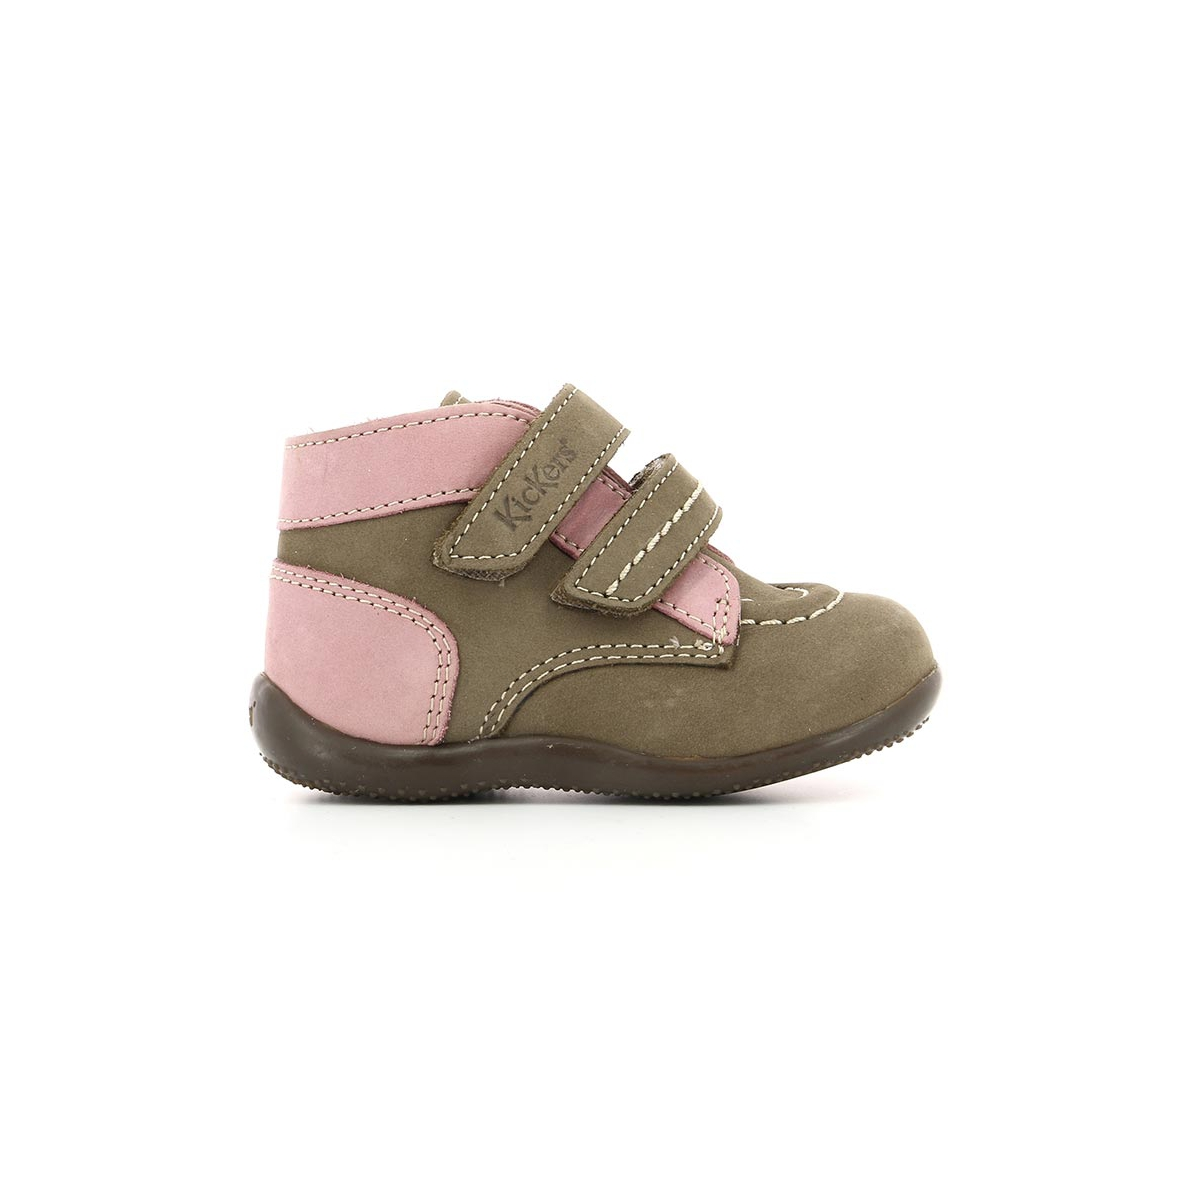 Niños Rosa Gris Bonkro Zapatos Kickers P10qzx